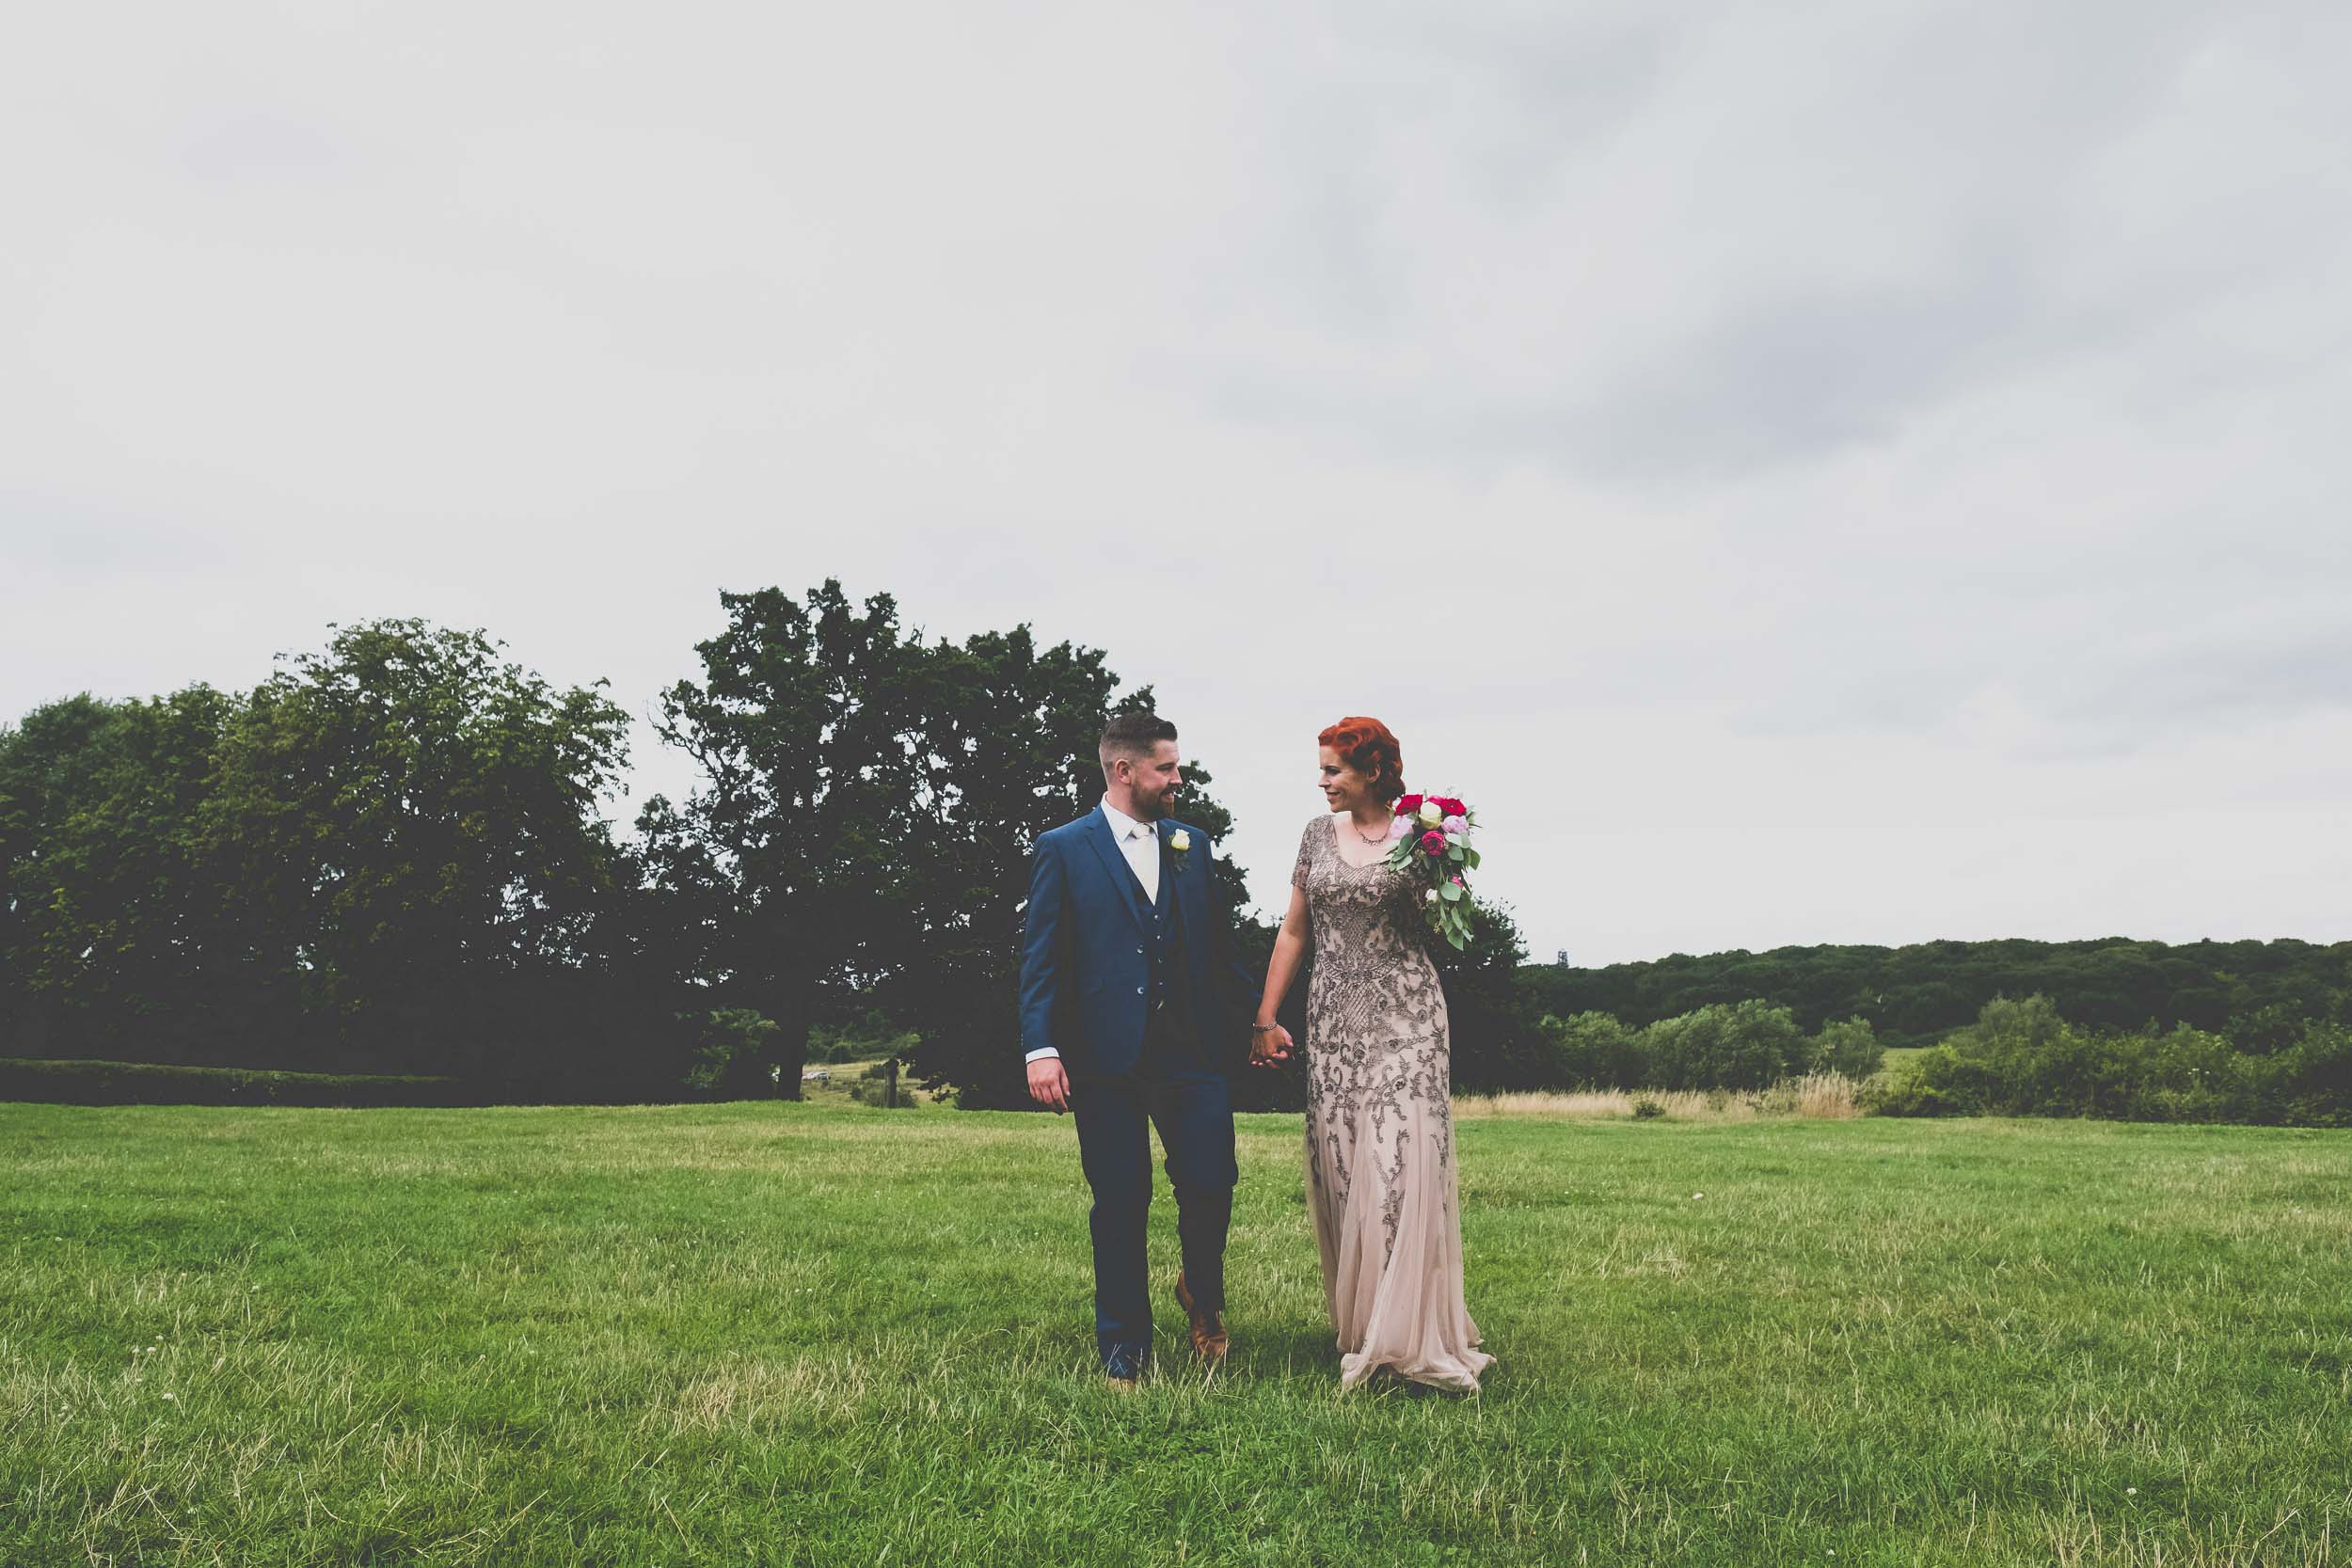 queen-elizabeths-hunting-lodge-epping-forest-wedding208.jpg